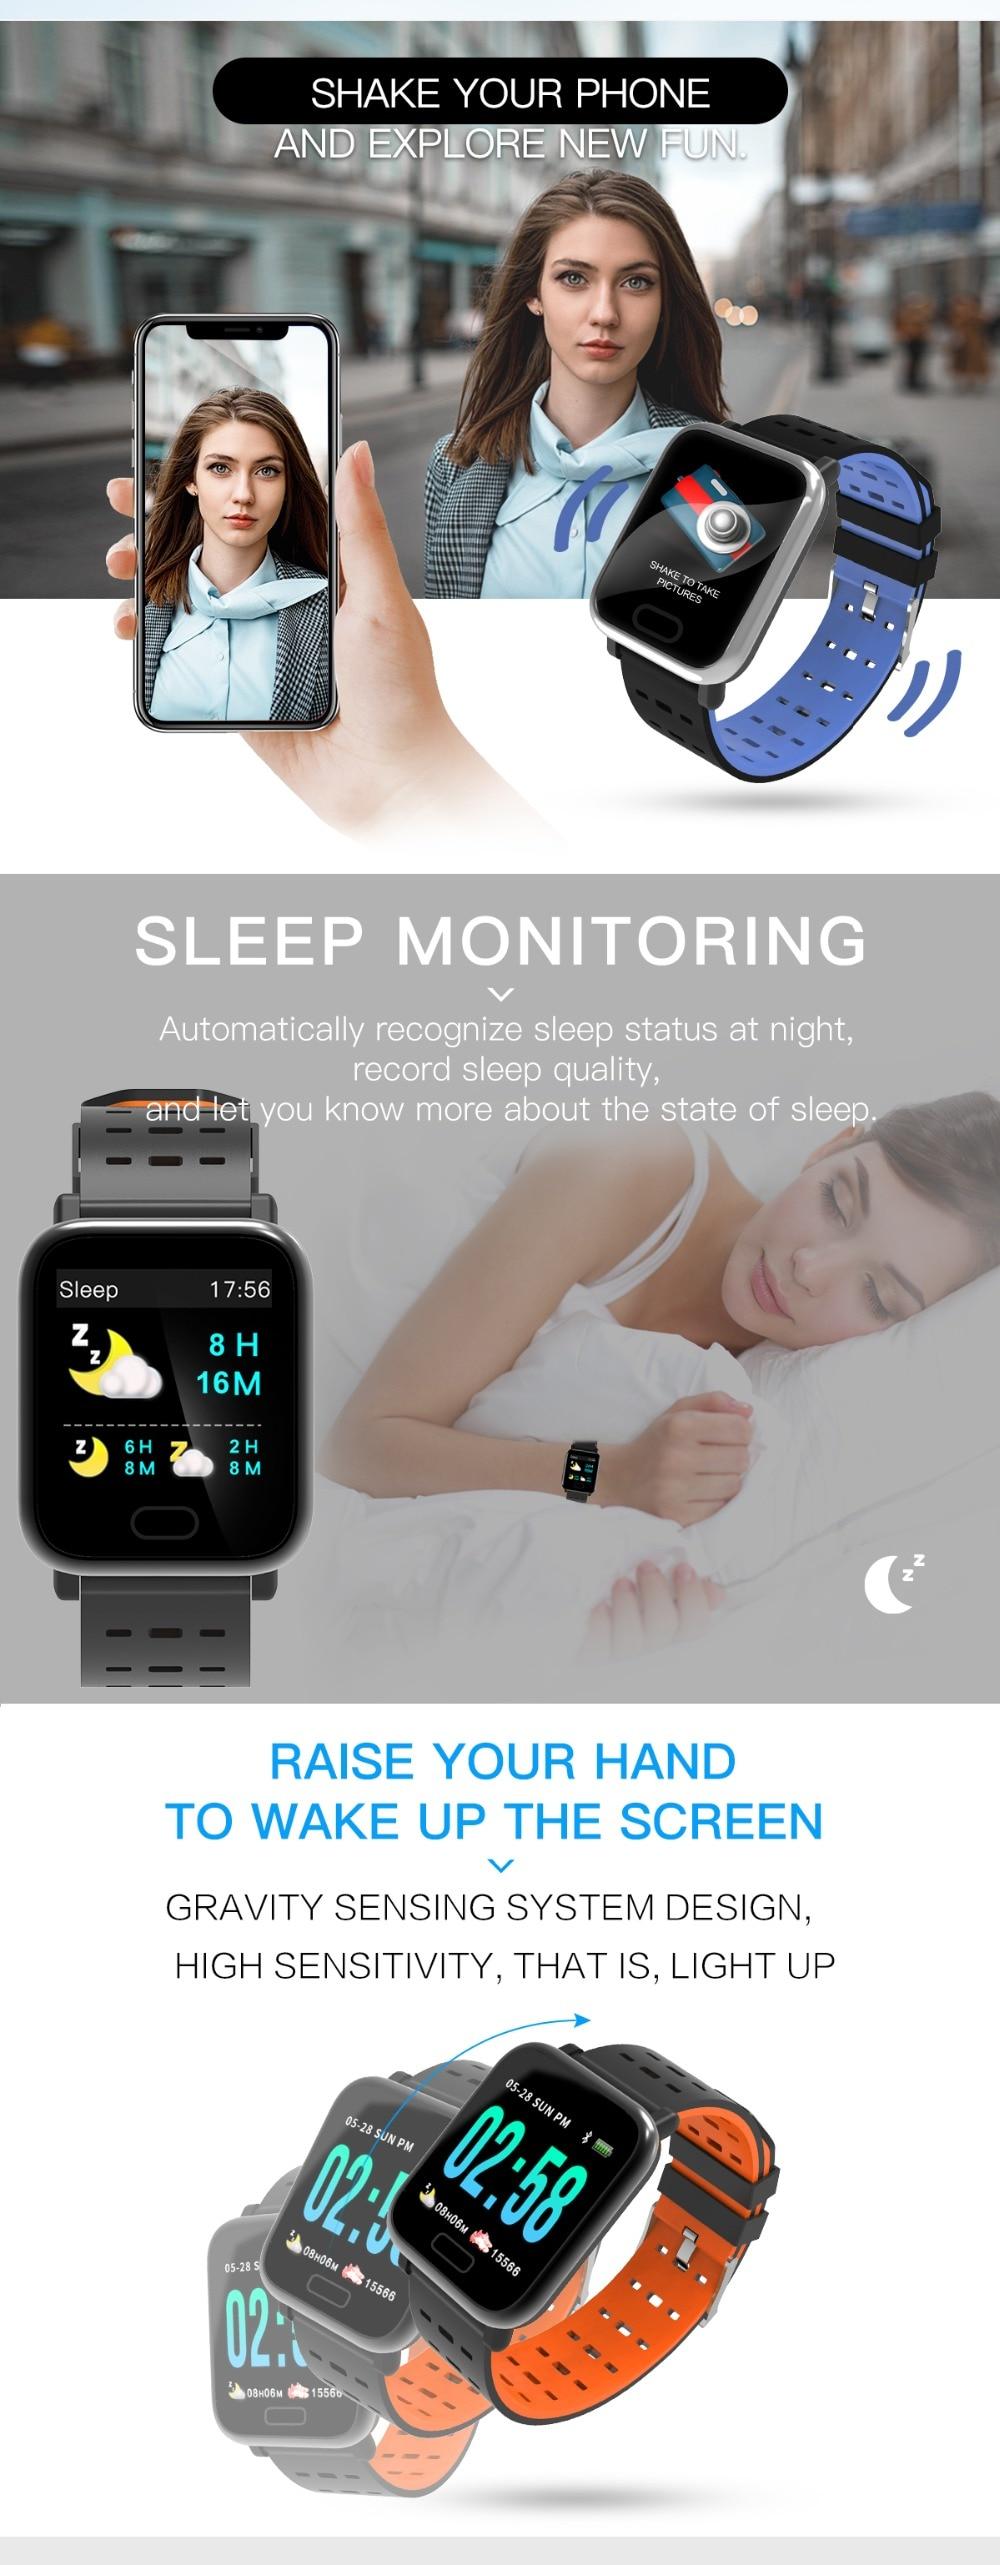 Wearpai bluetooth kids smart watch sport A6 fitness tracker men women heart rate Monitor watches for ios android waterproof ip67 8